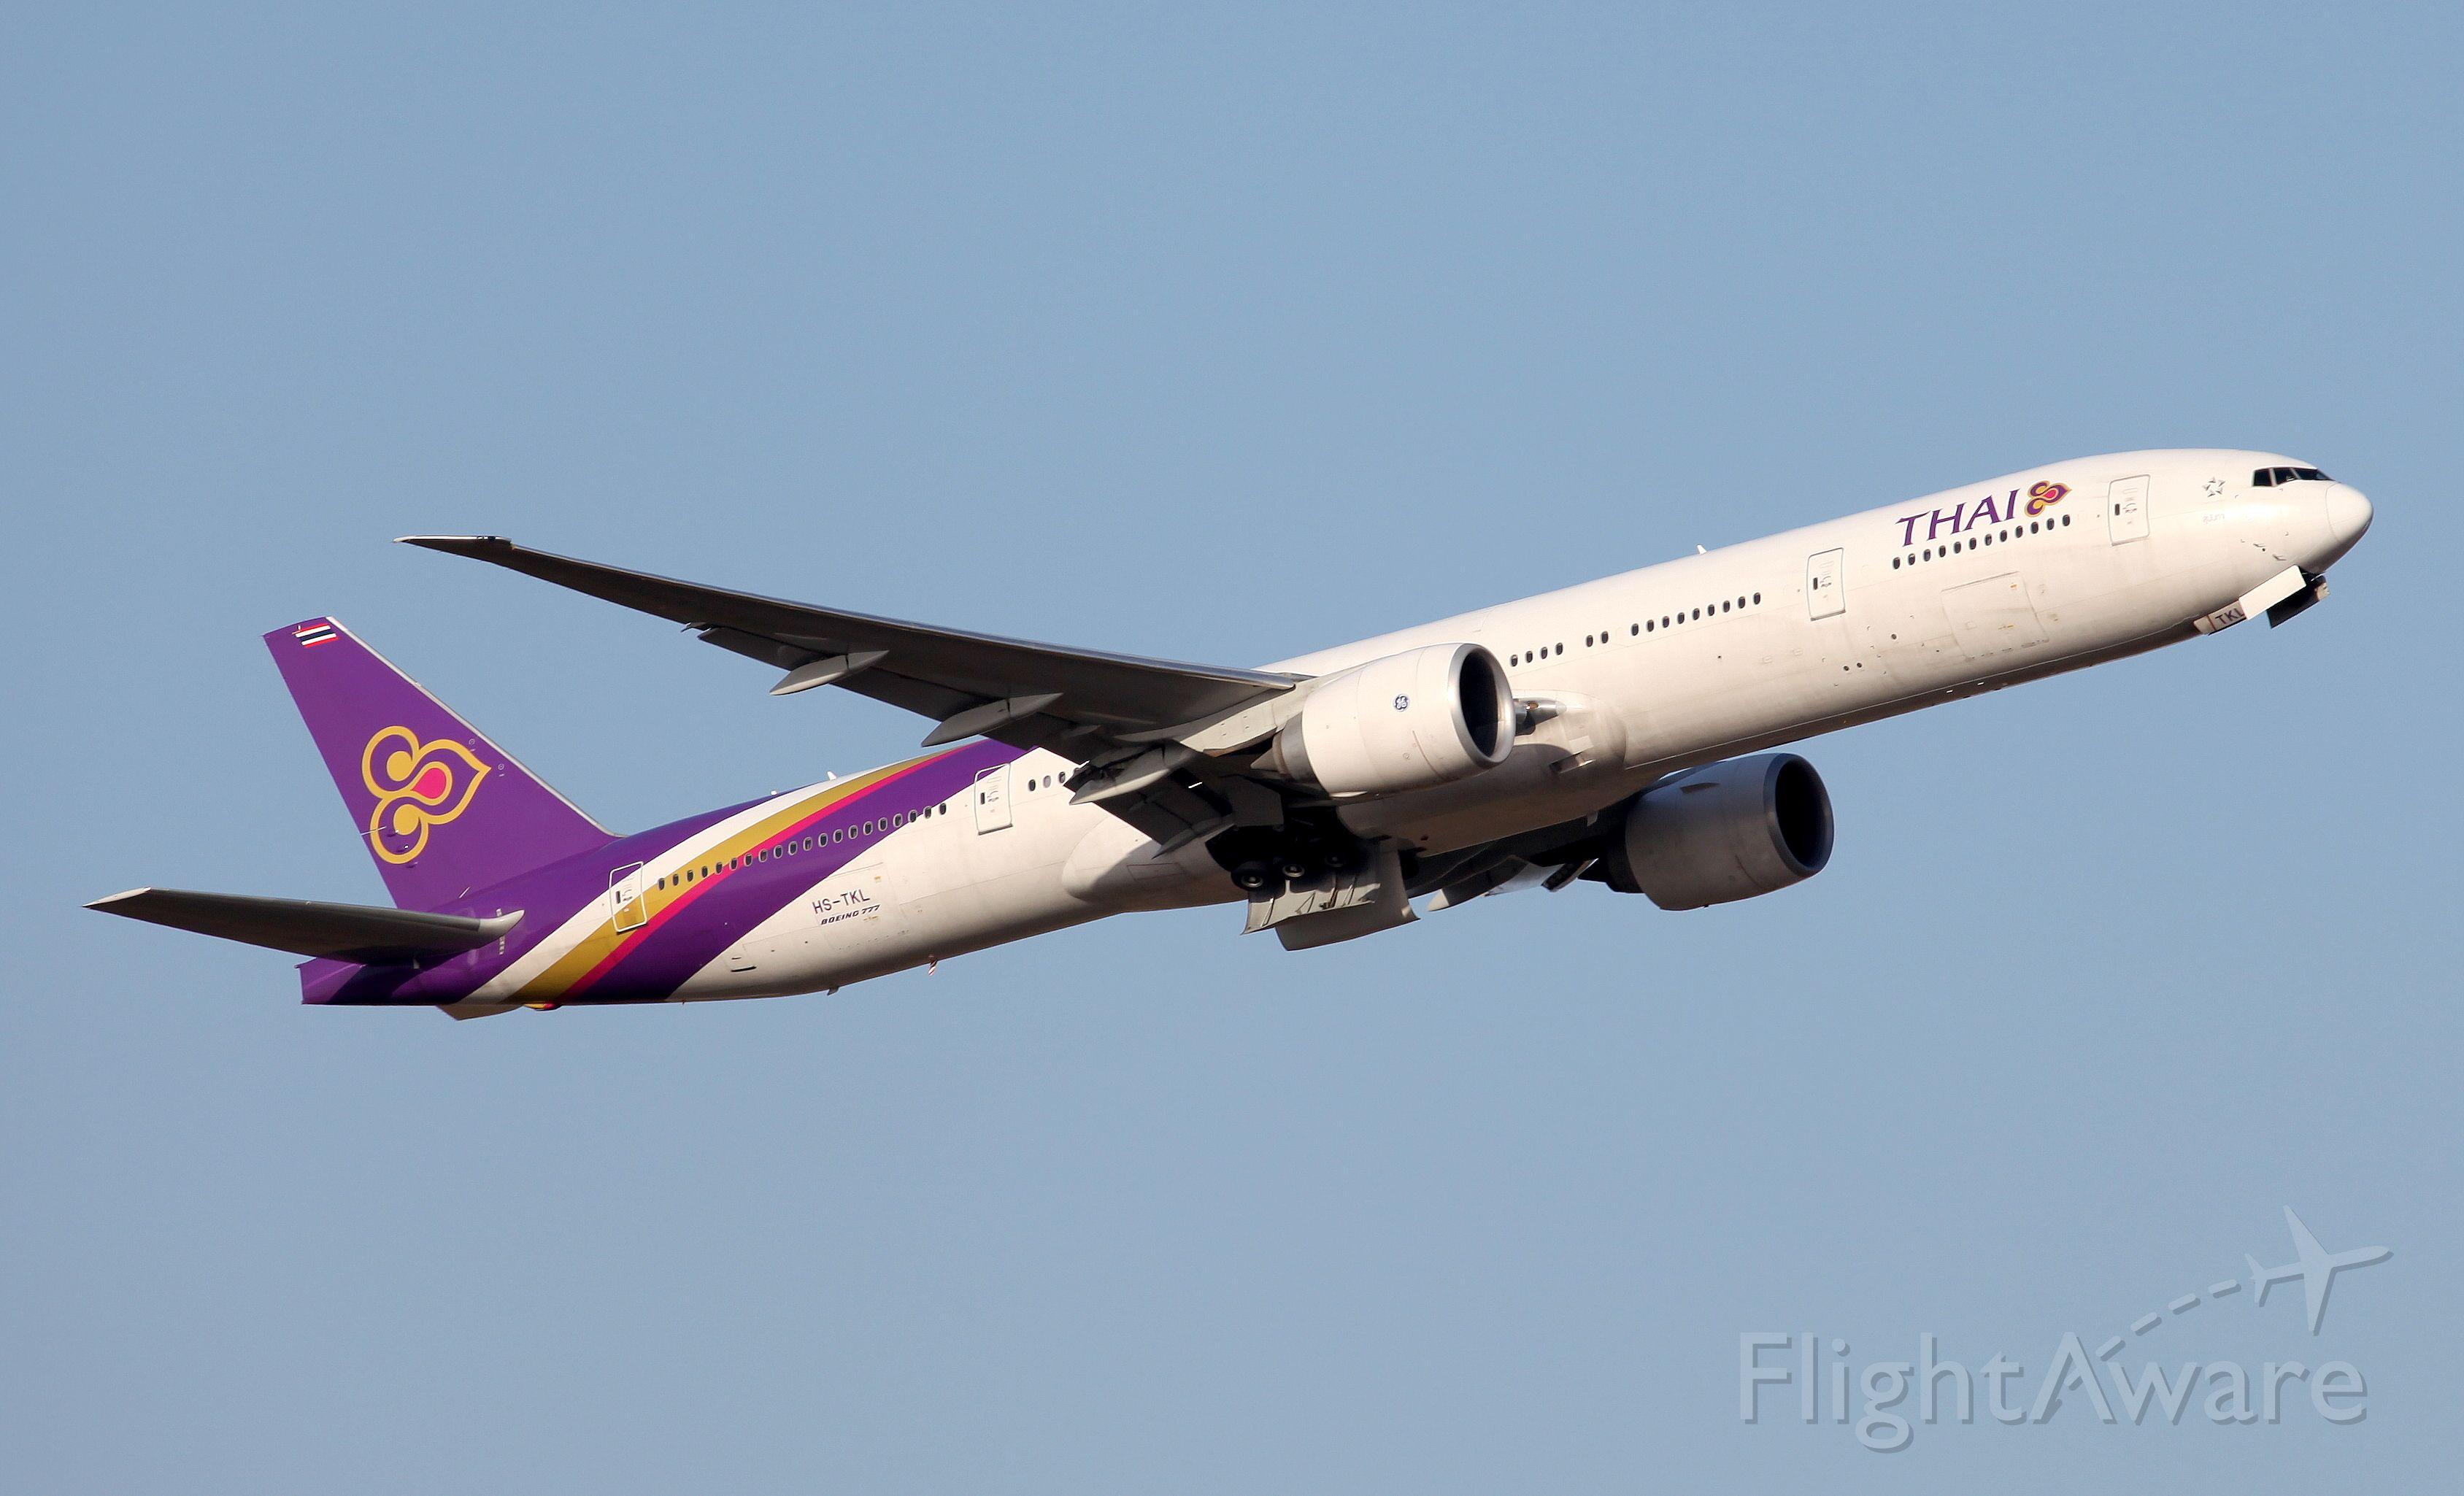 BOEING 777-300ER (HS-TKL) - Departing Rwy 19L